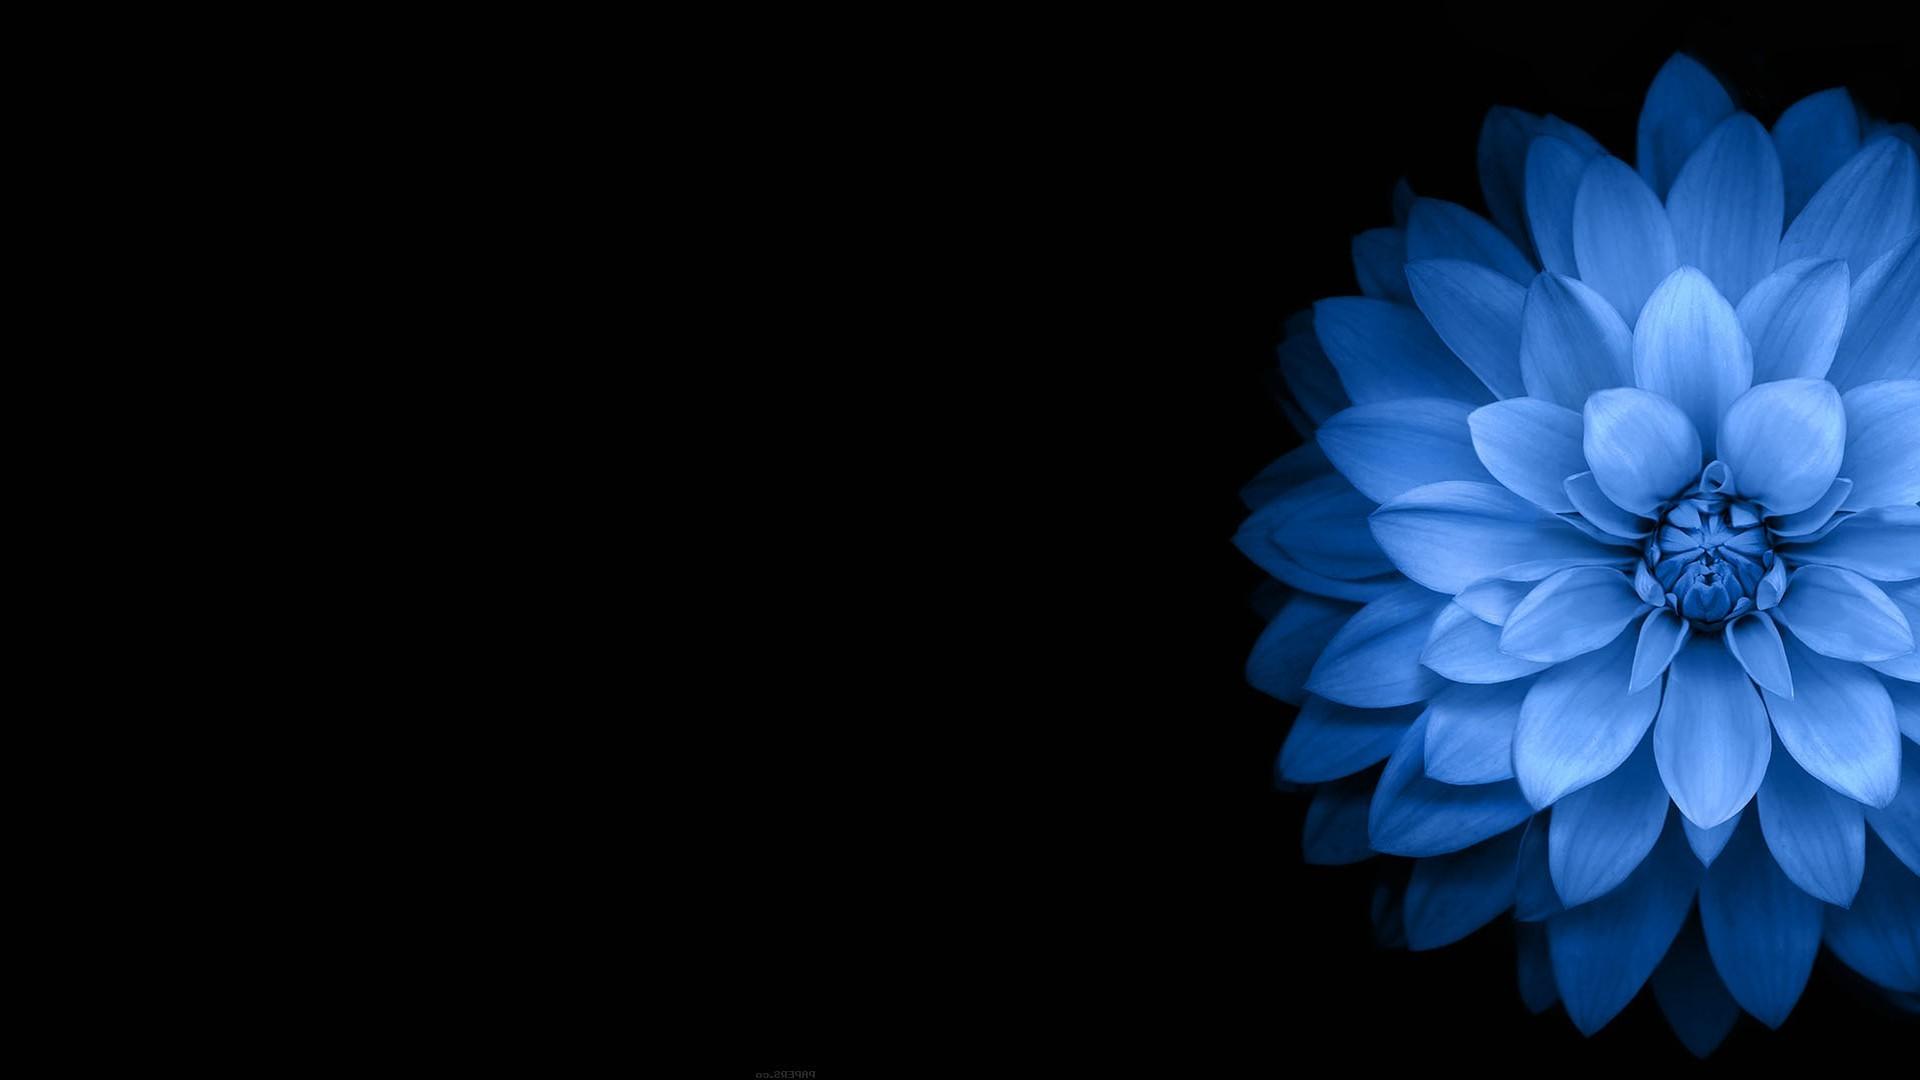 Blue Flower Desktop Wallpaper Hd